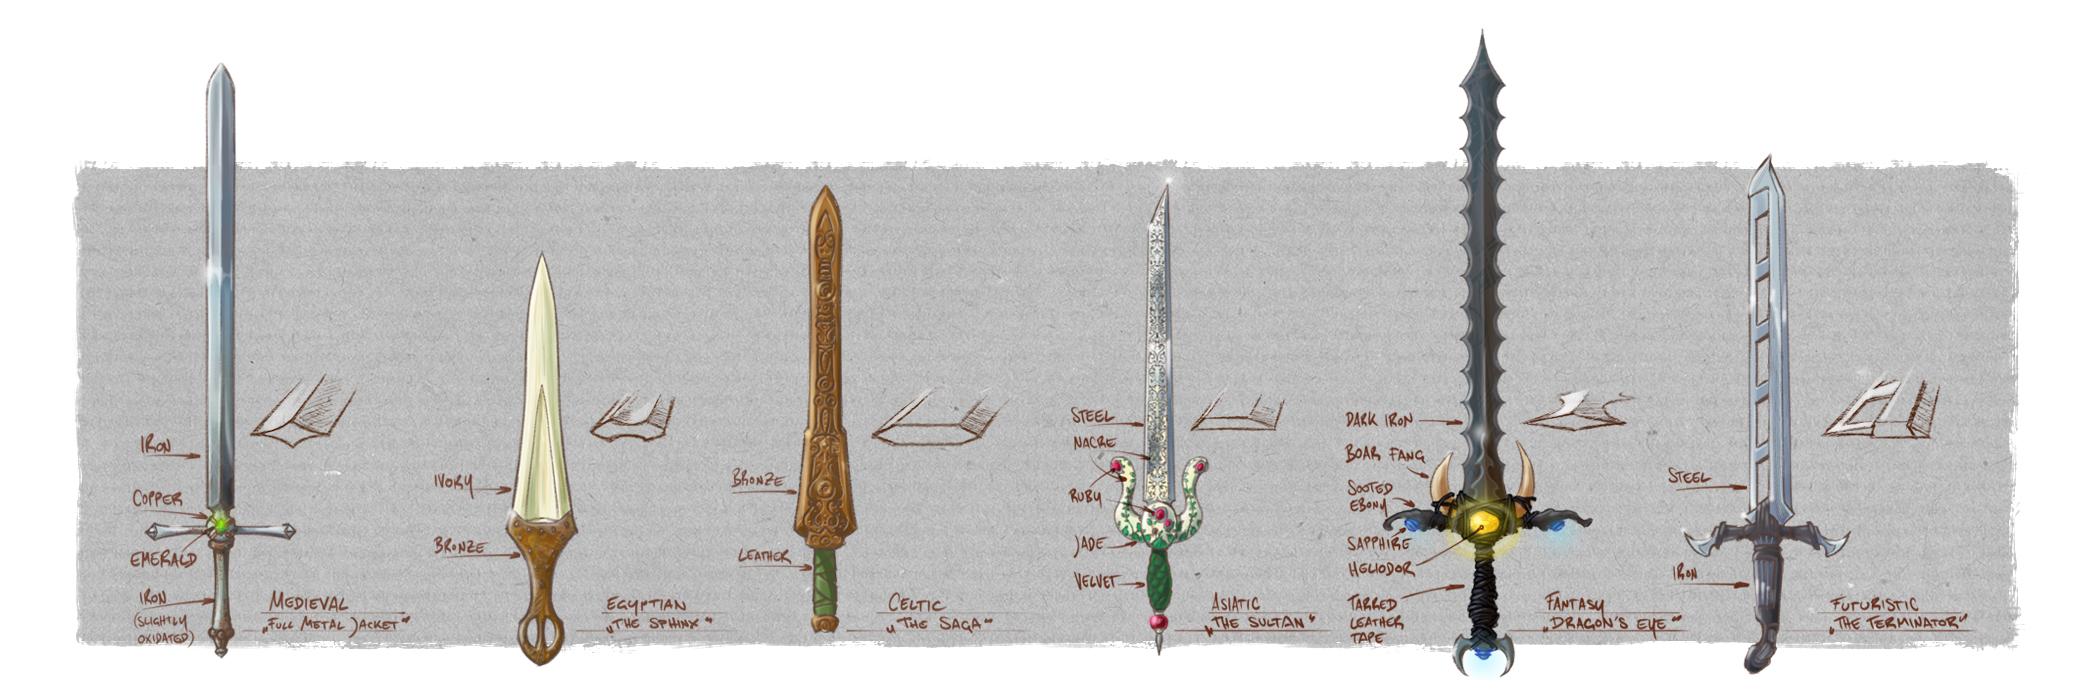 Prop Design of swords for a Dungeon Crawler